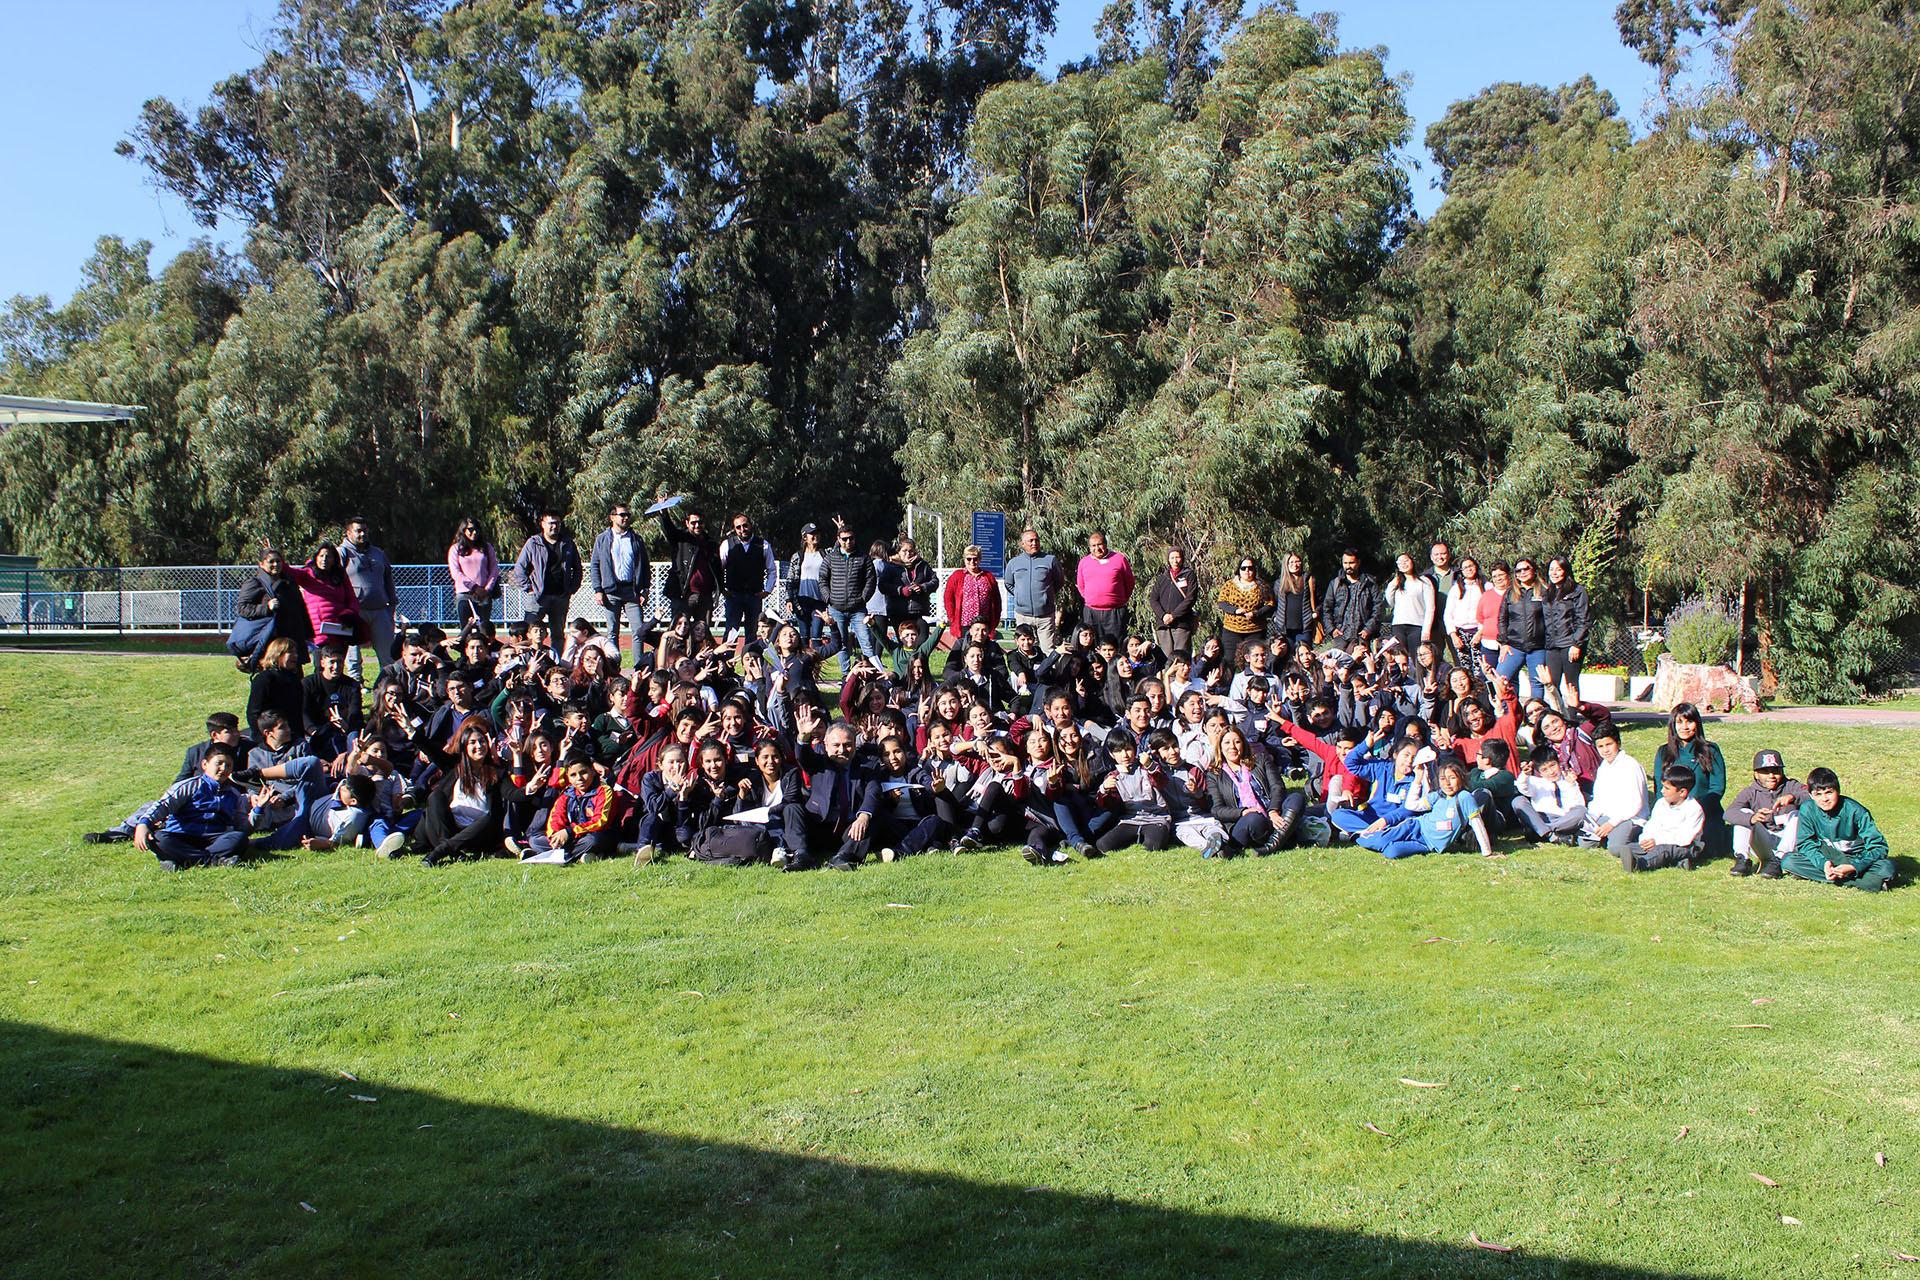 Centros de alumnos pertenecientes al Servicio Local Huasco participan en 2da Jornada Territorial